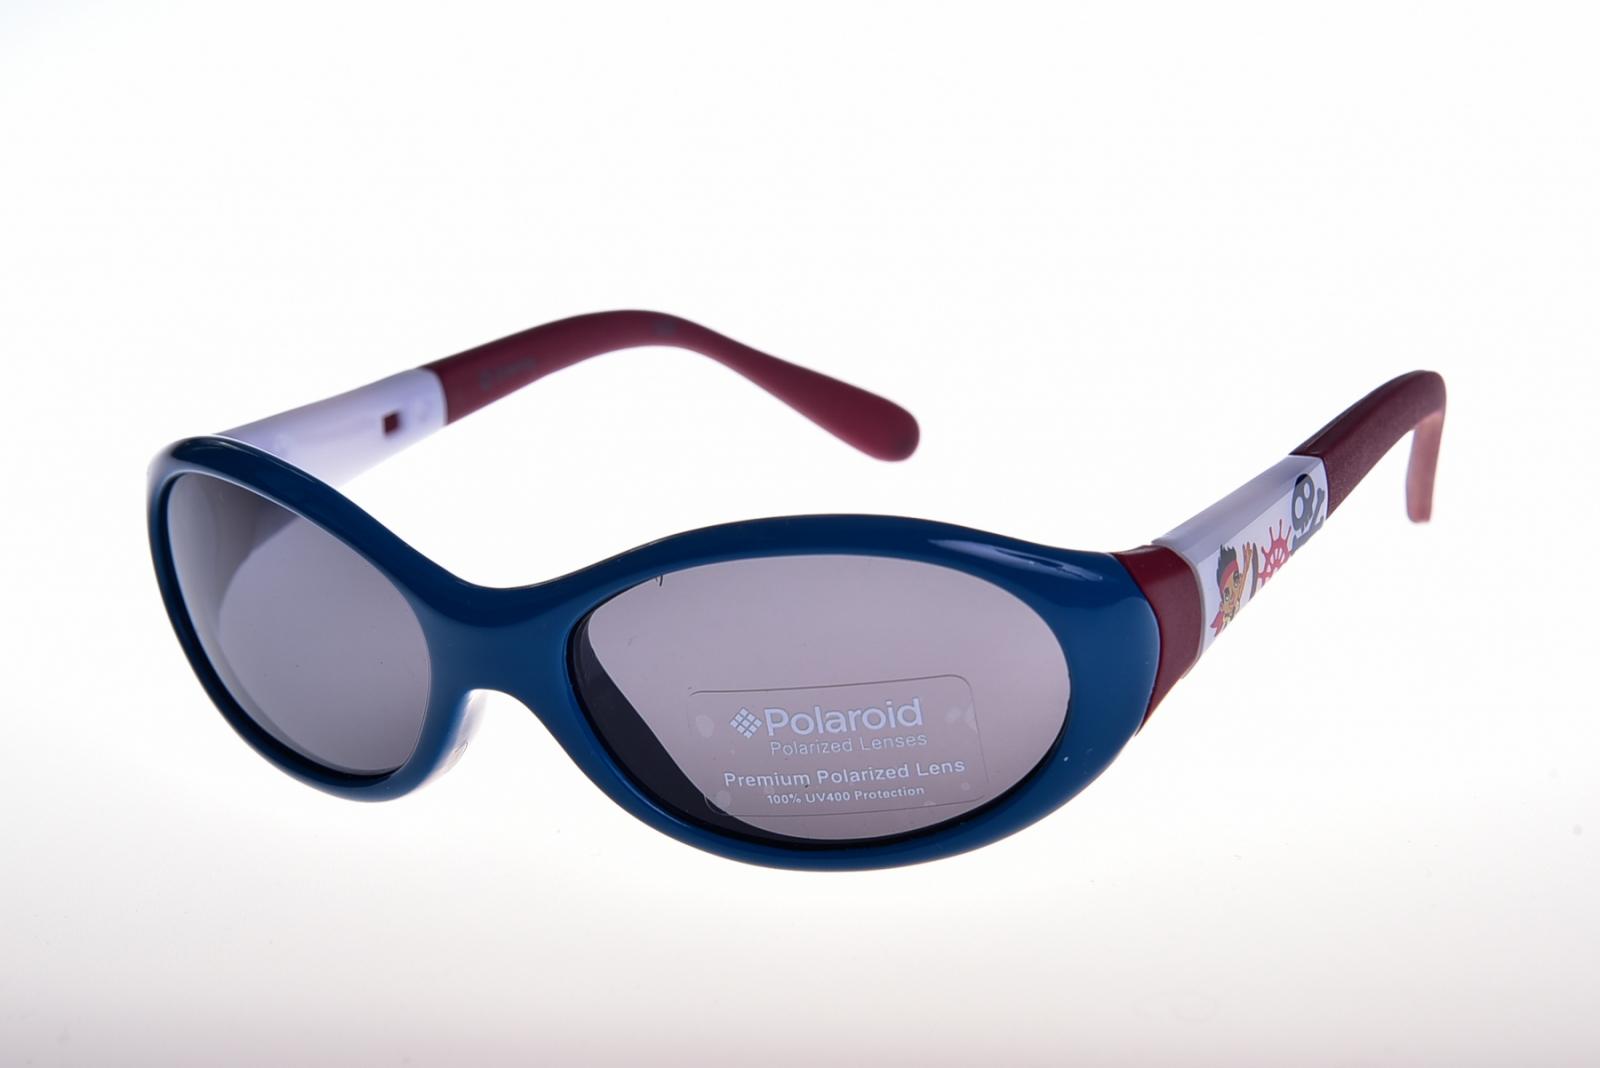 Polaroid Disney D0316B - Slnečné okuliare pre deti 1-3 r.